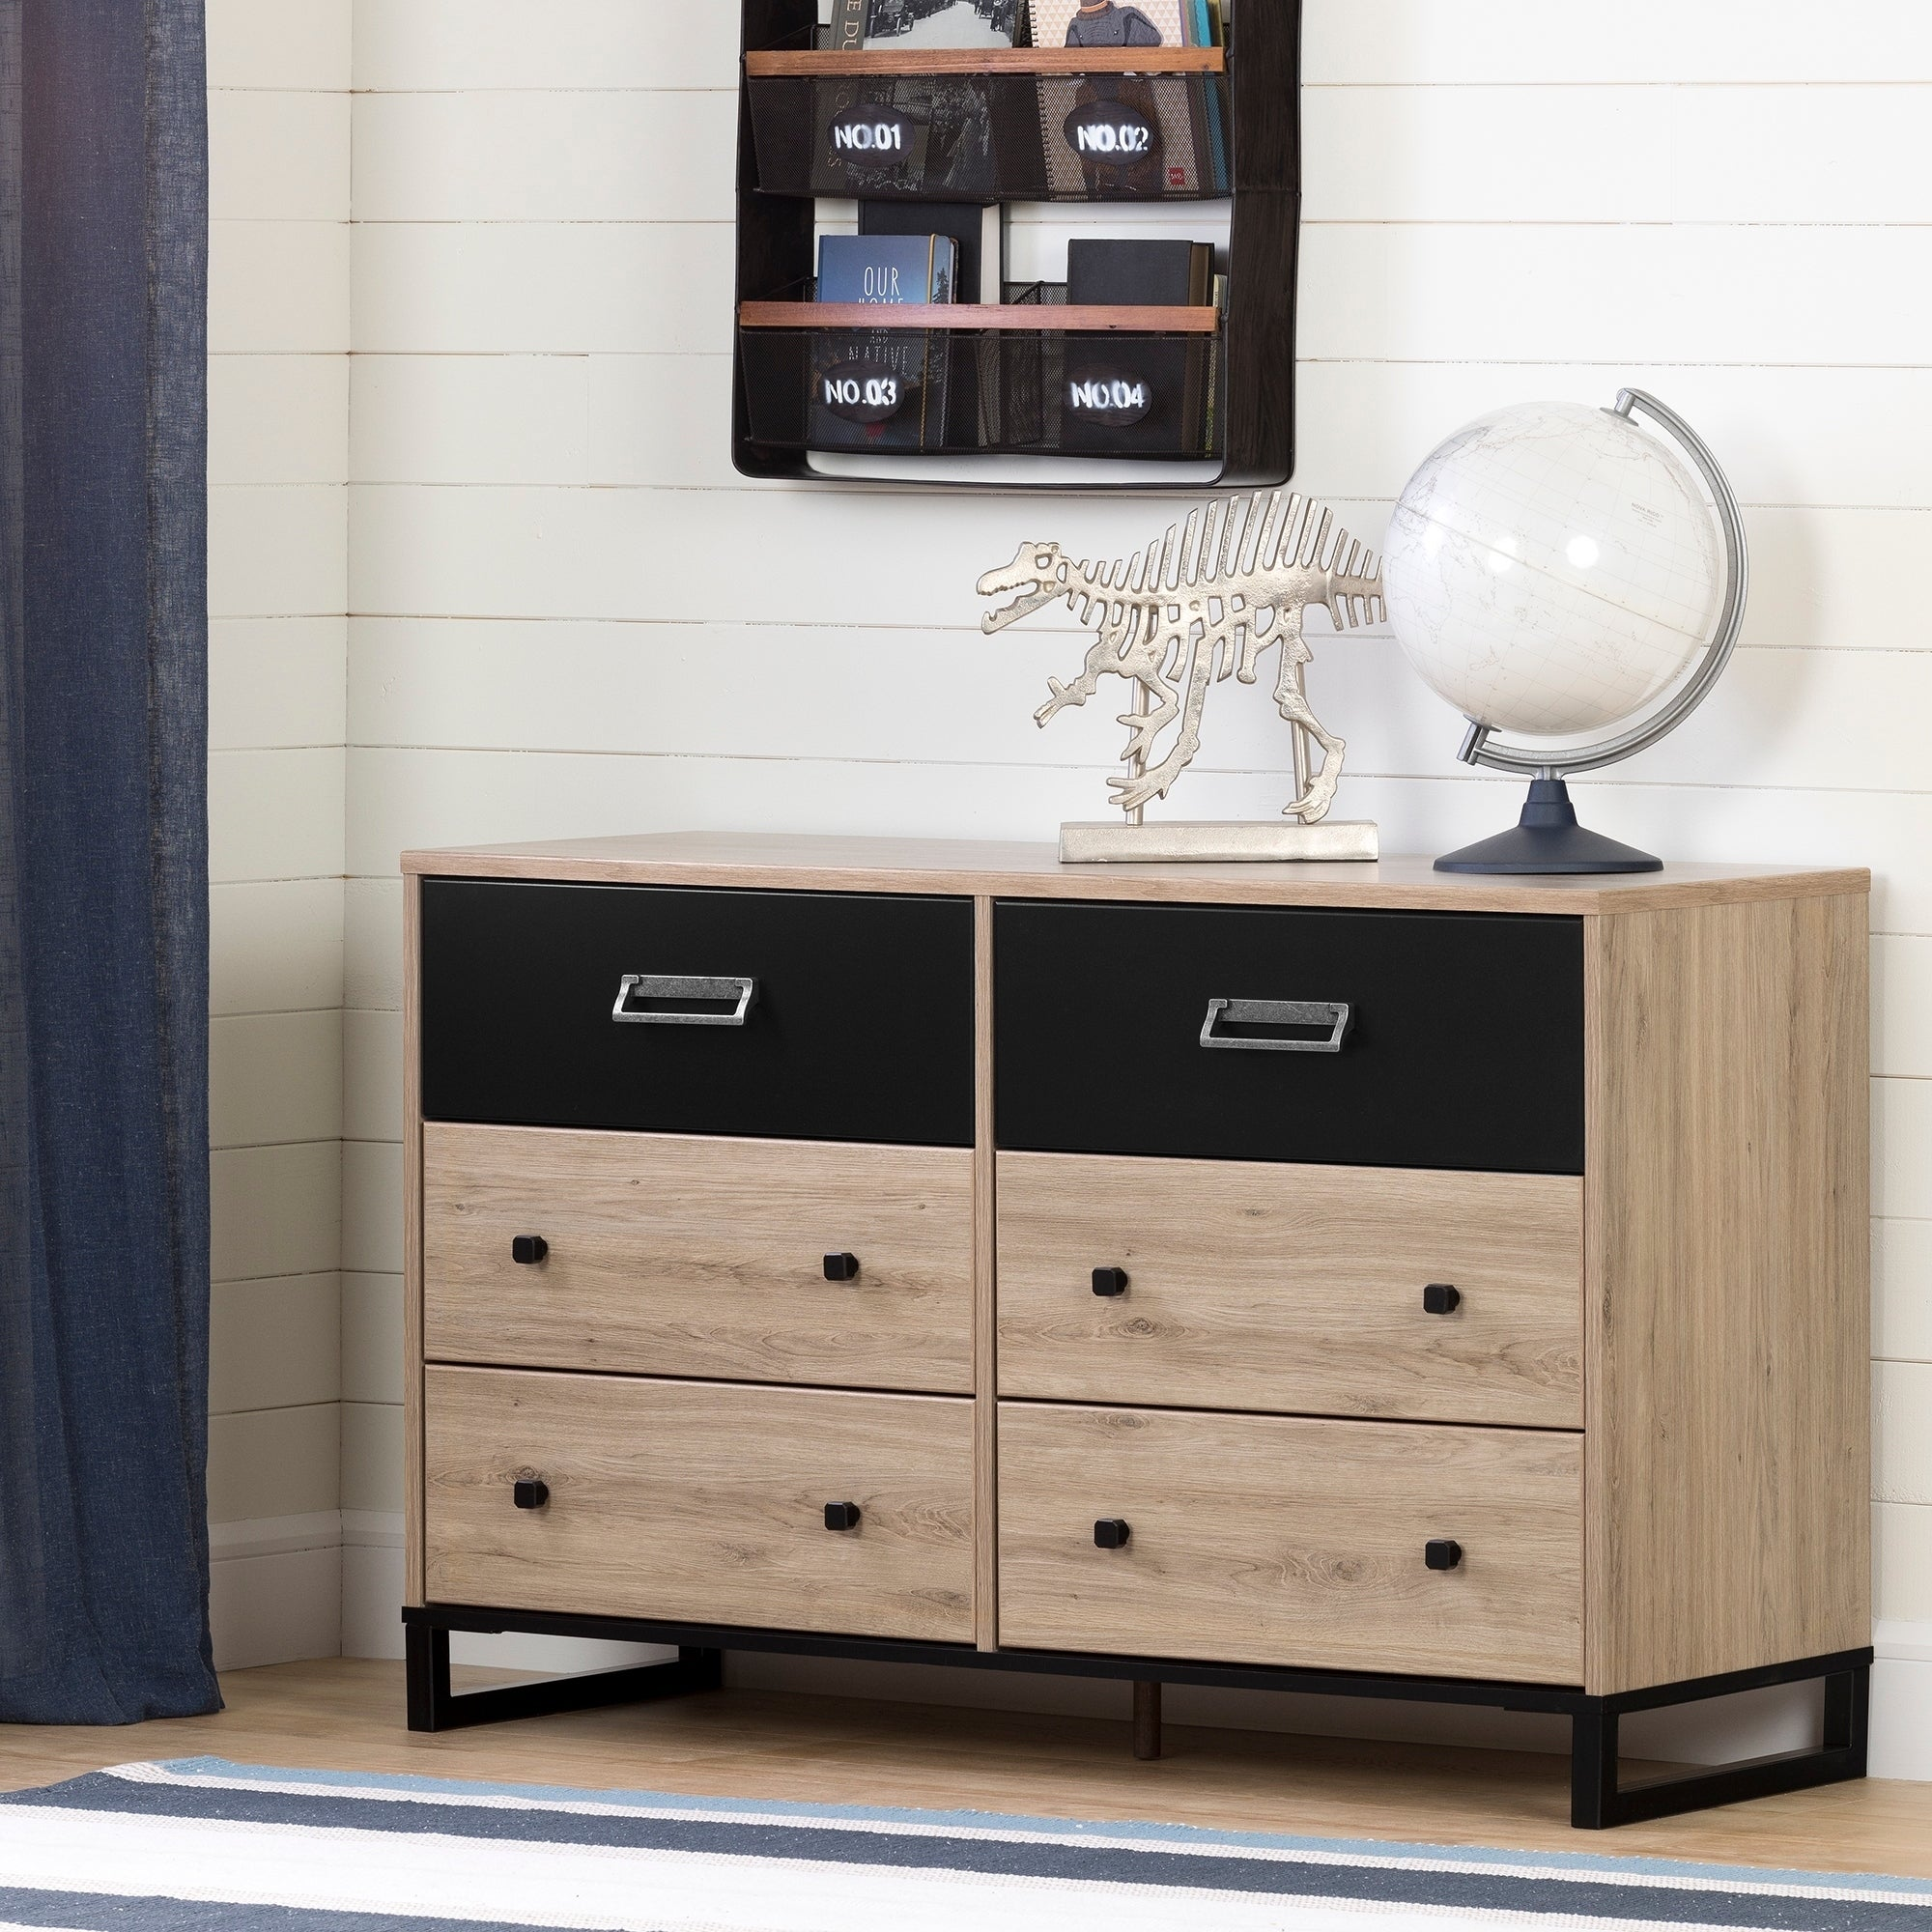 South Shore Induzy  6-Drawer Double Dresser (Rustic Oak and Matte Black)